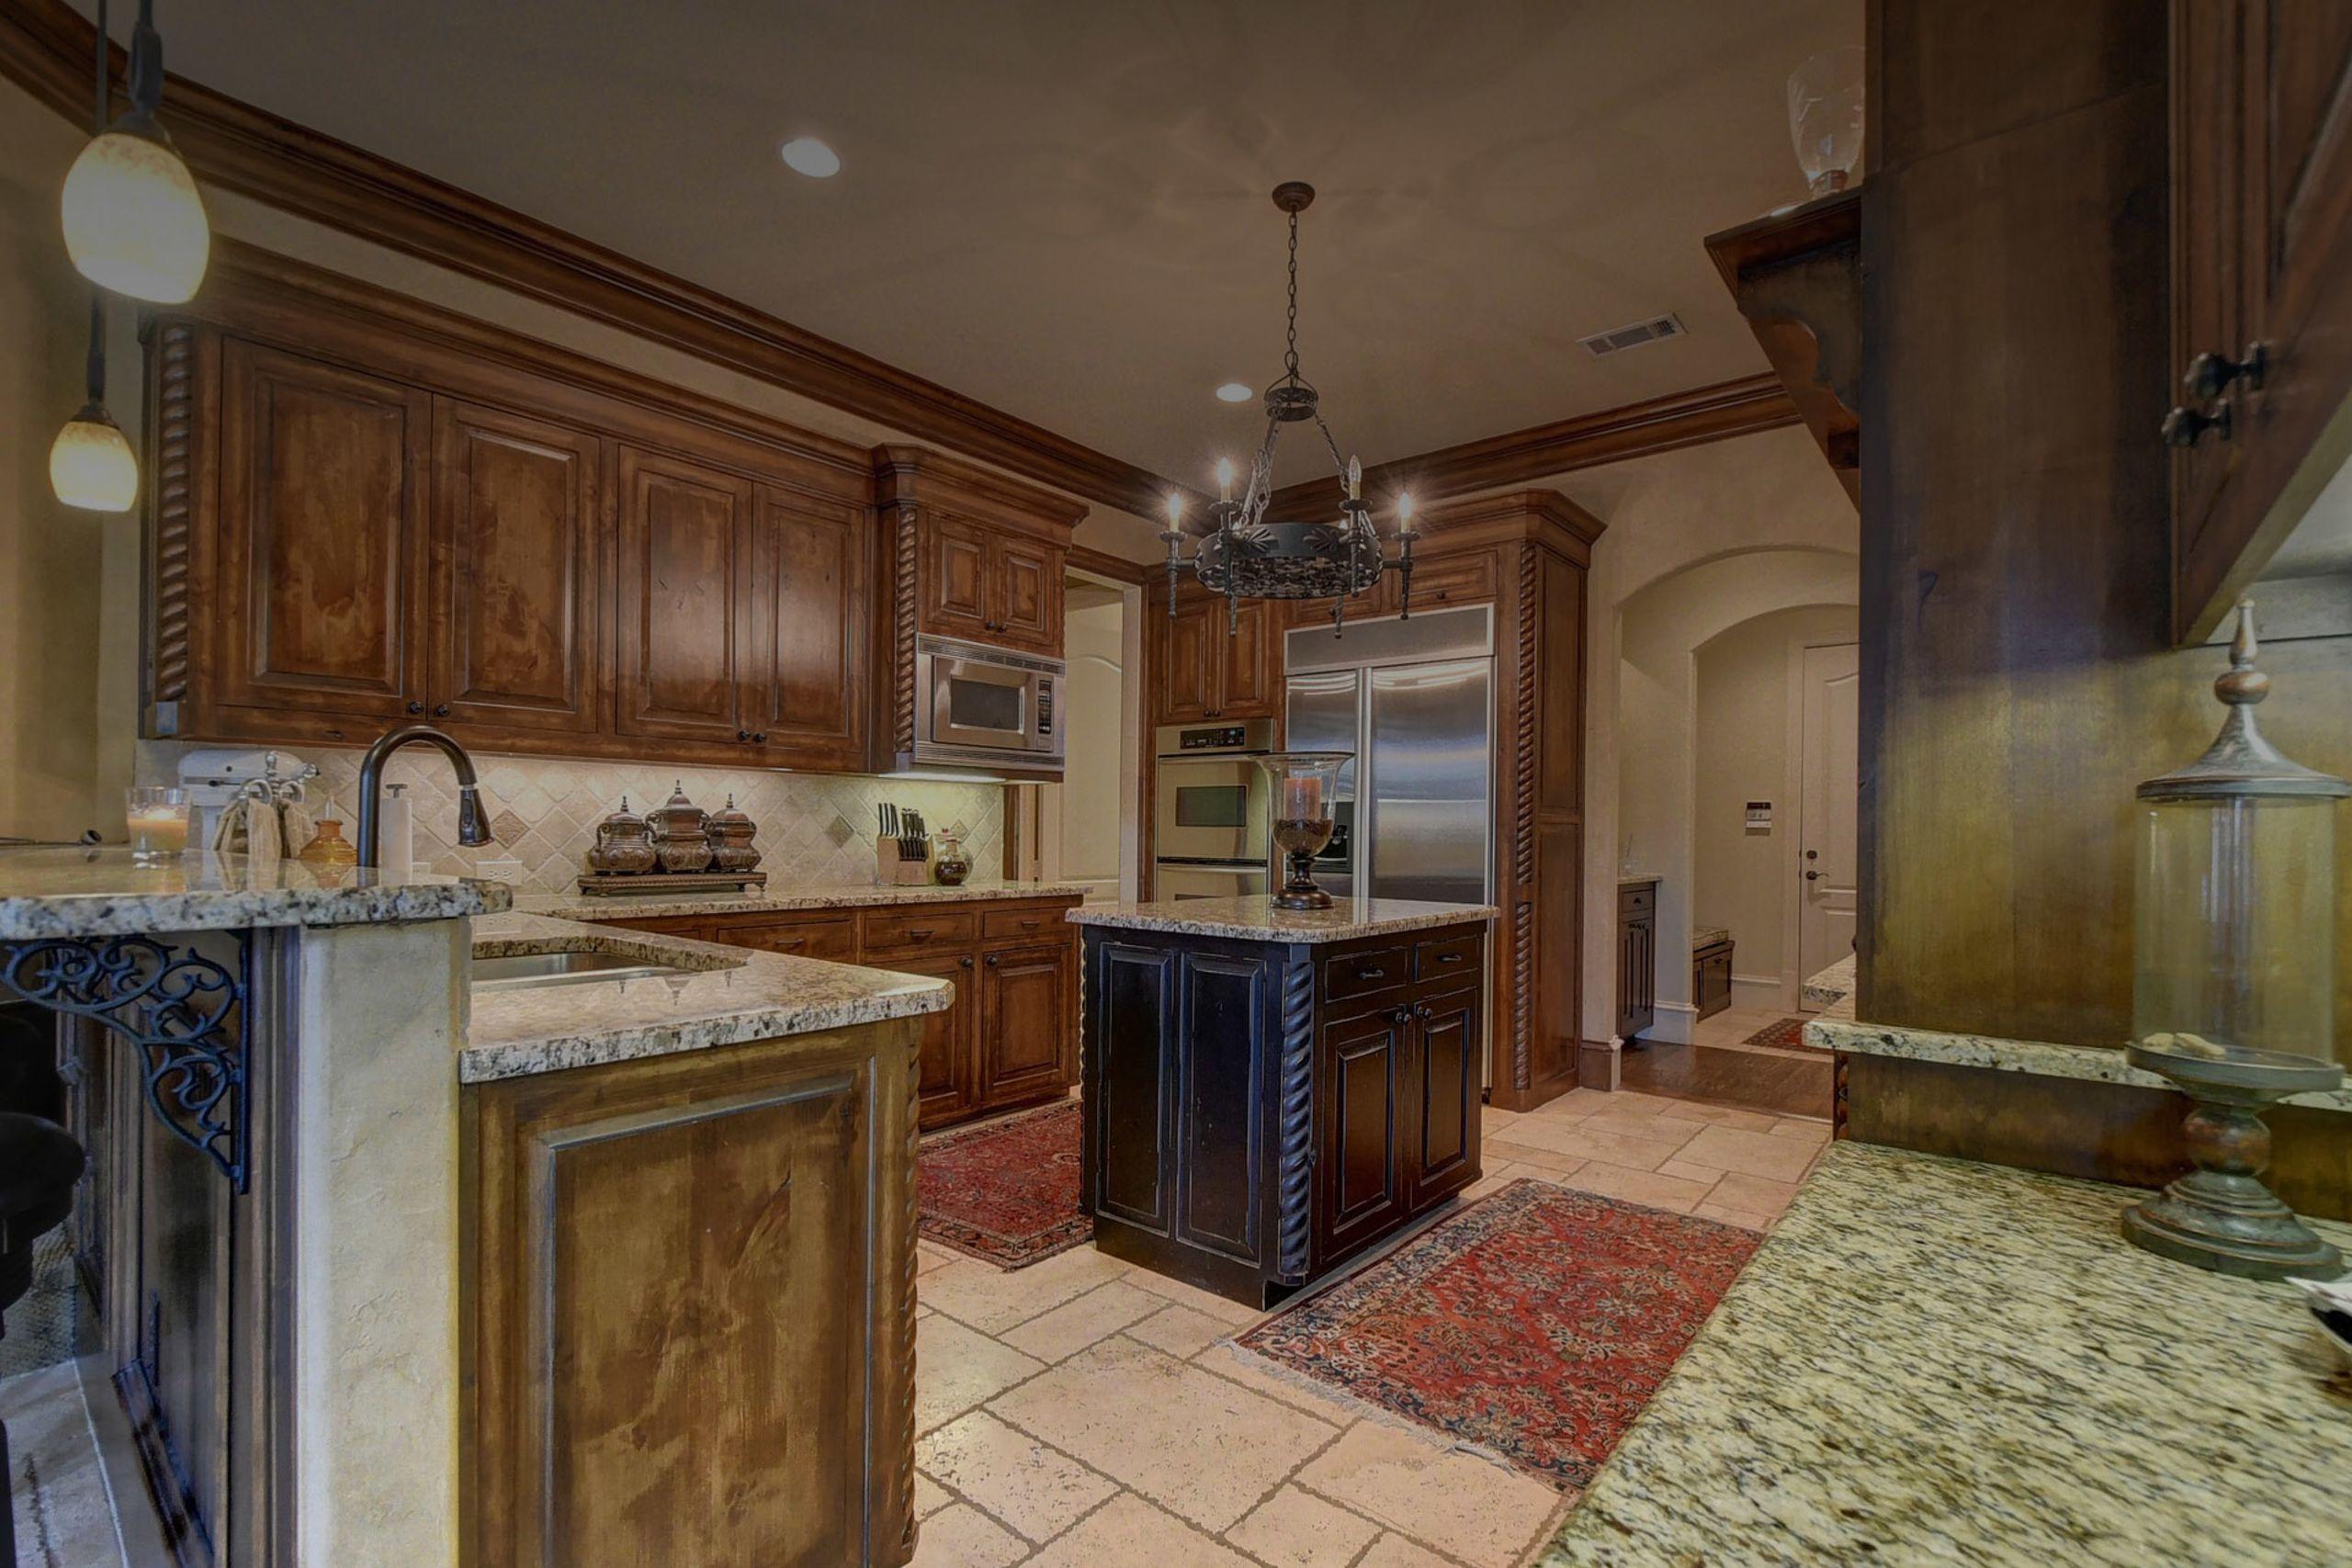 Quality kitchen craftsmanship